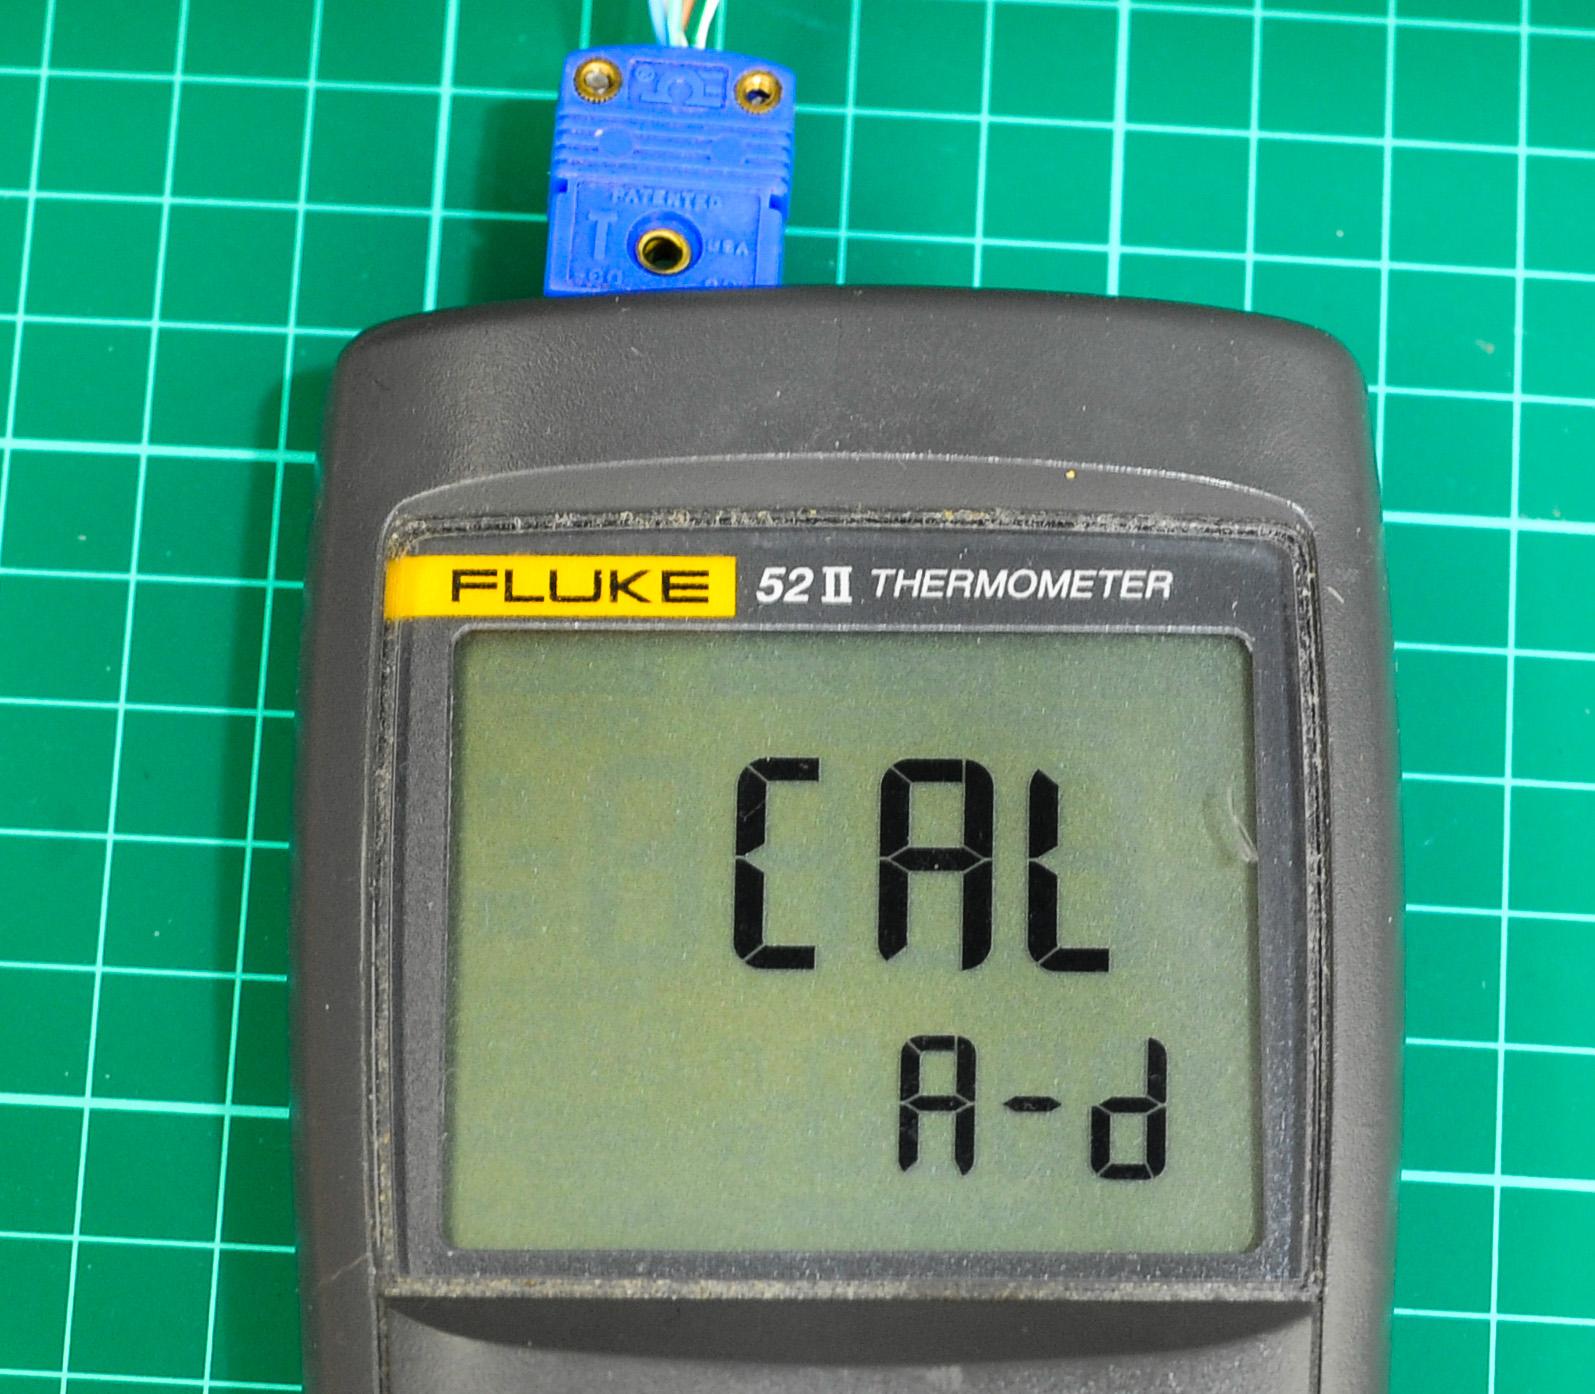 xDevs com | Fluke 52 II thermometer calibration tutorial